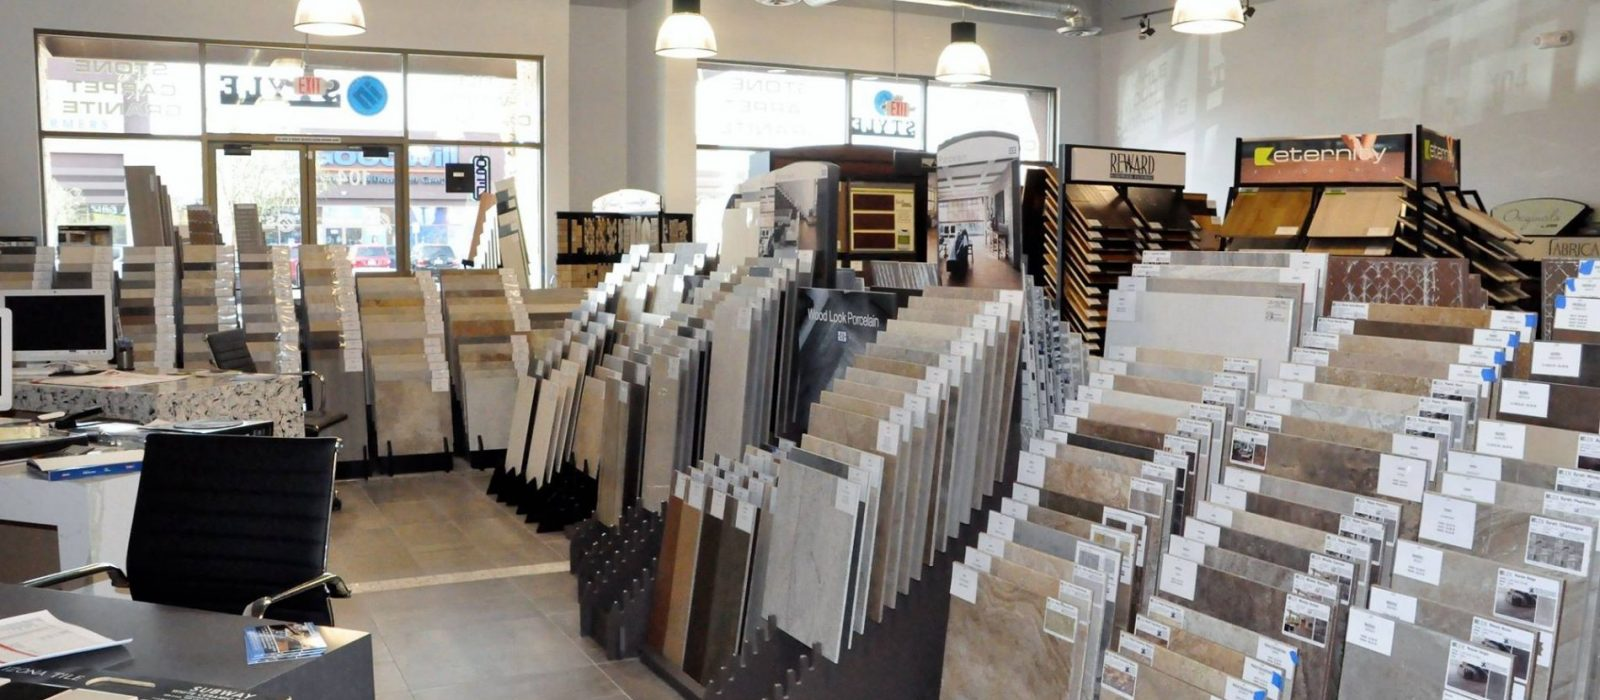 carpet stores las vegas visit our design center in style flooring and las vegas flooring kitchen bath